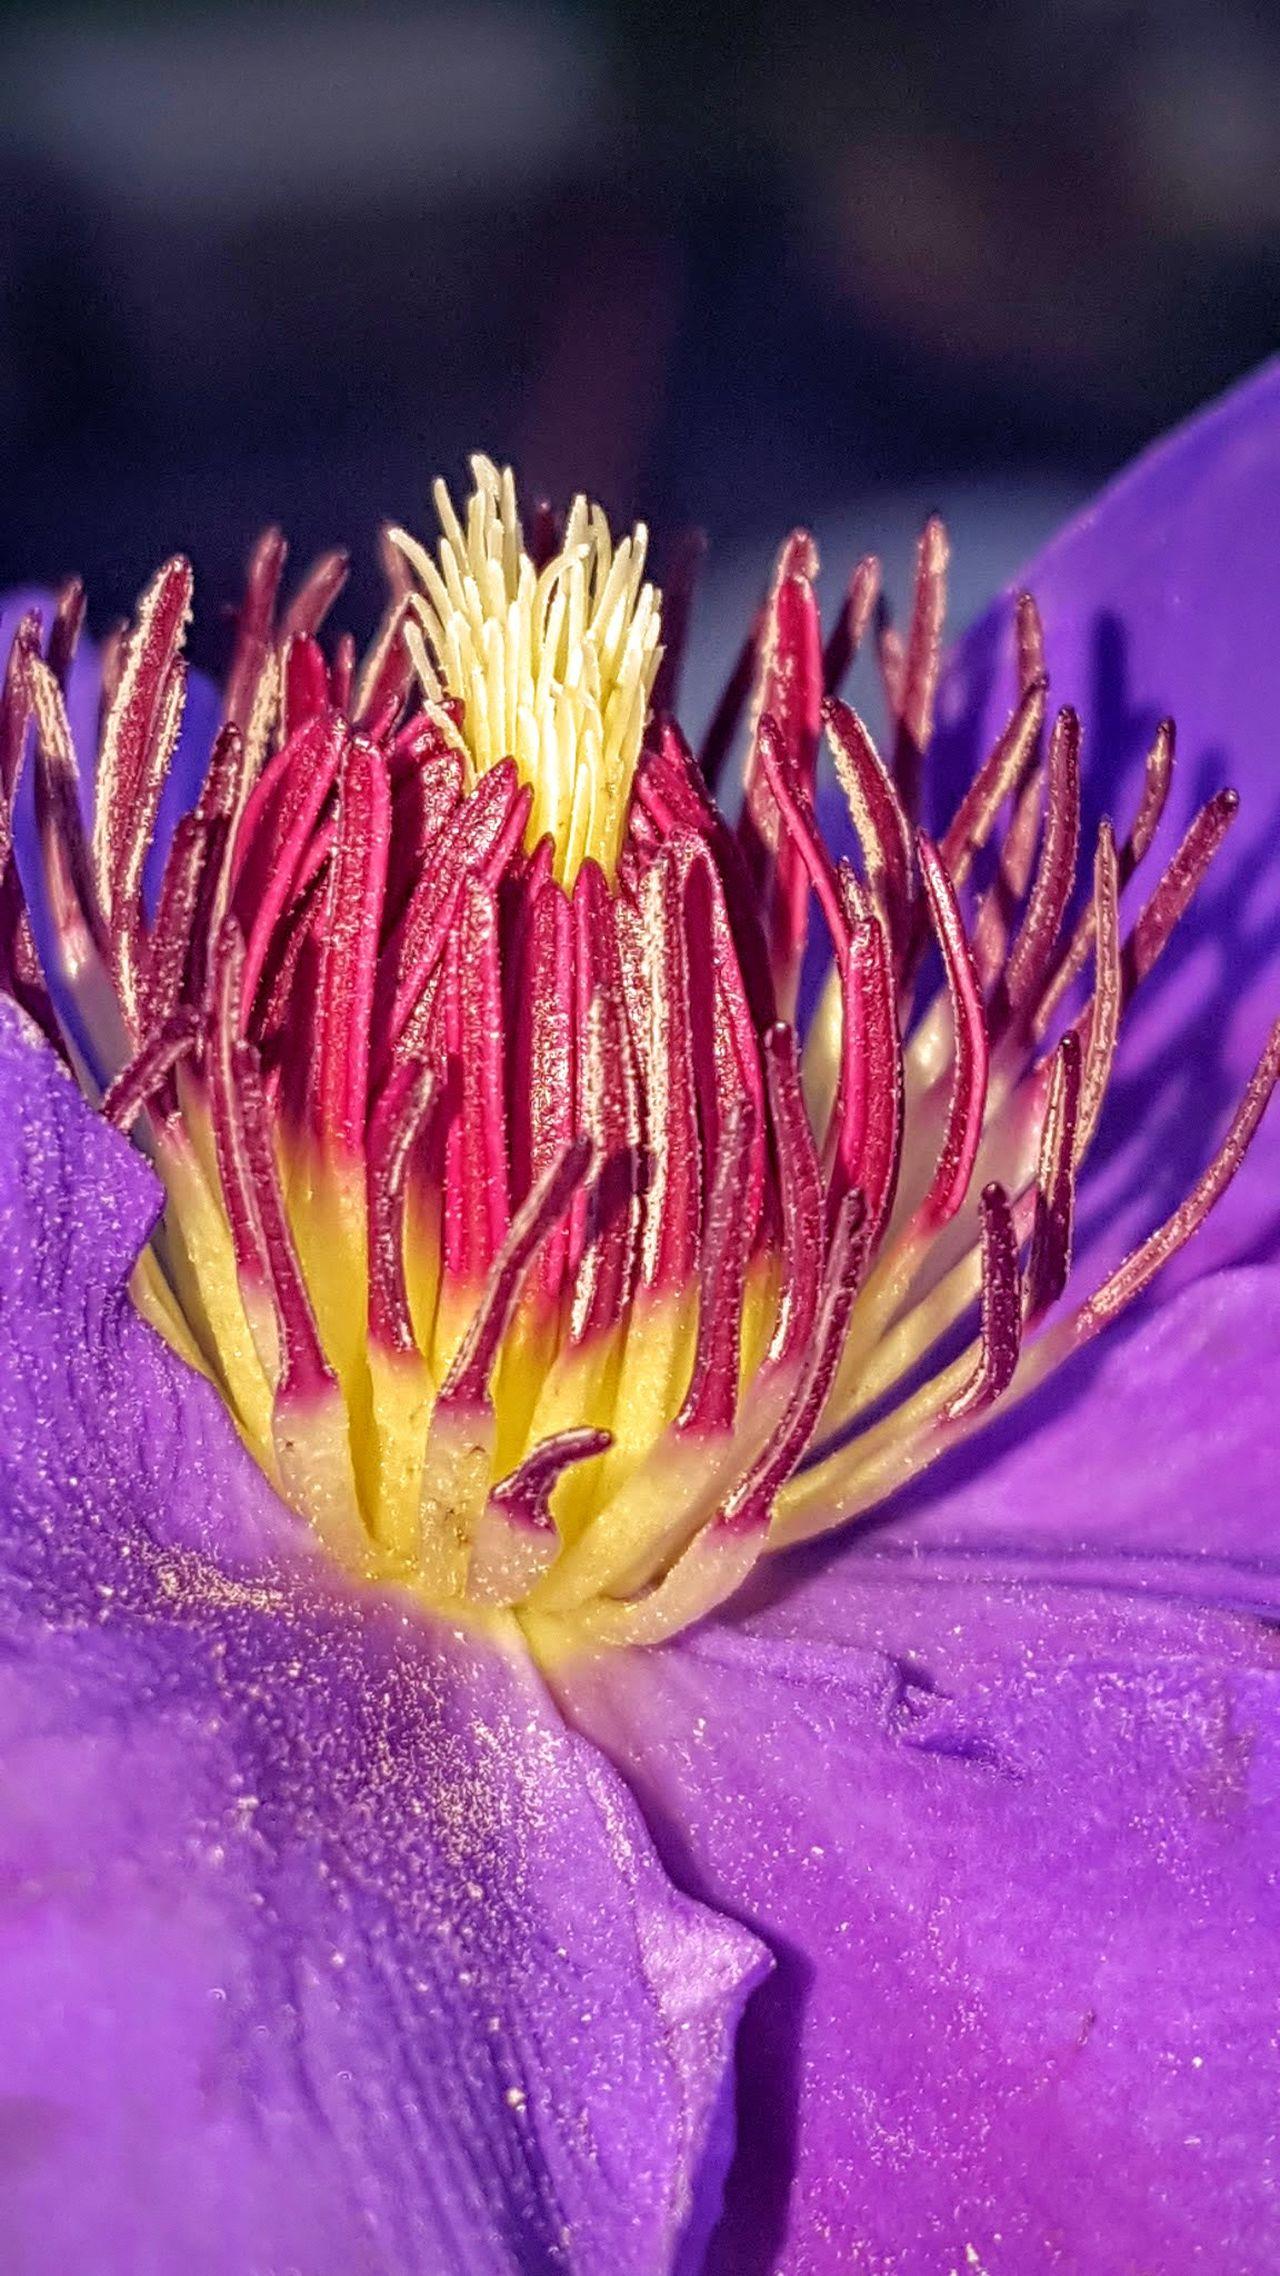 Clematis Clematis Flower Clematis Seed Head Purple Flower Clematis, Flower Flower Head Purple Flowers Flower Purple